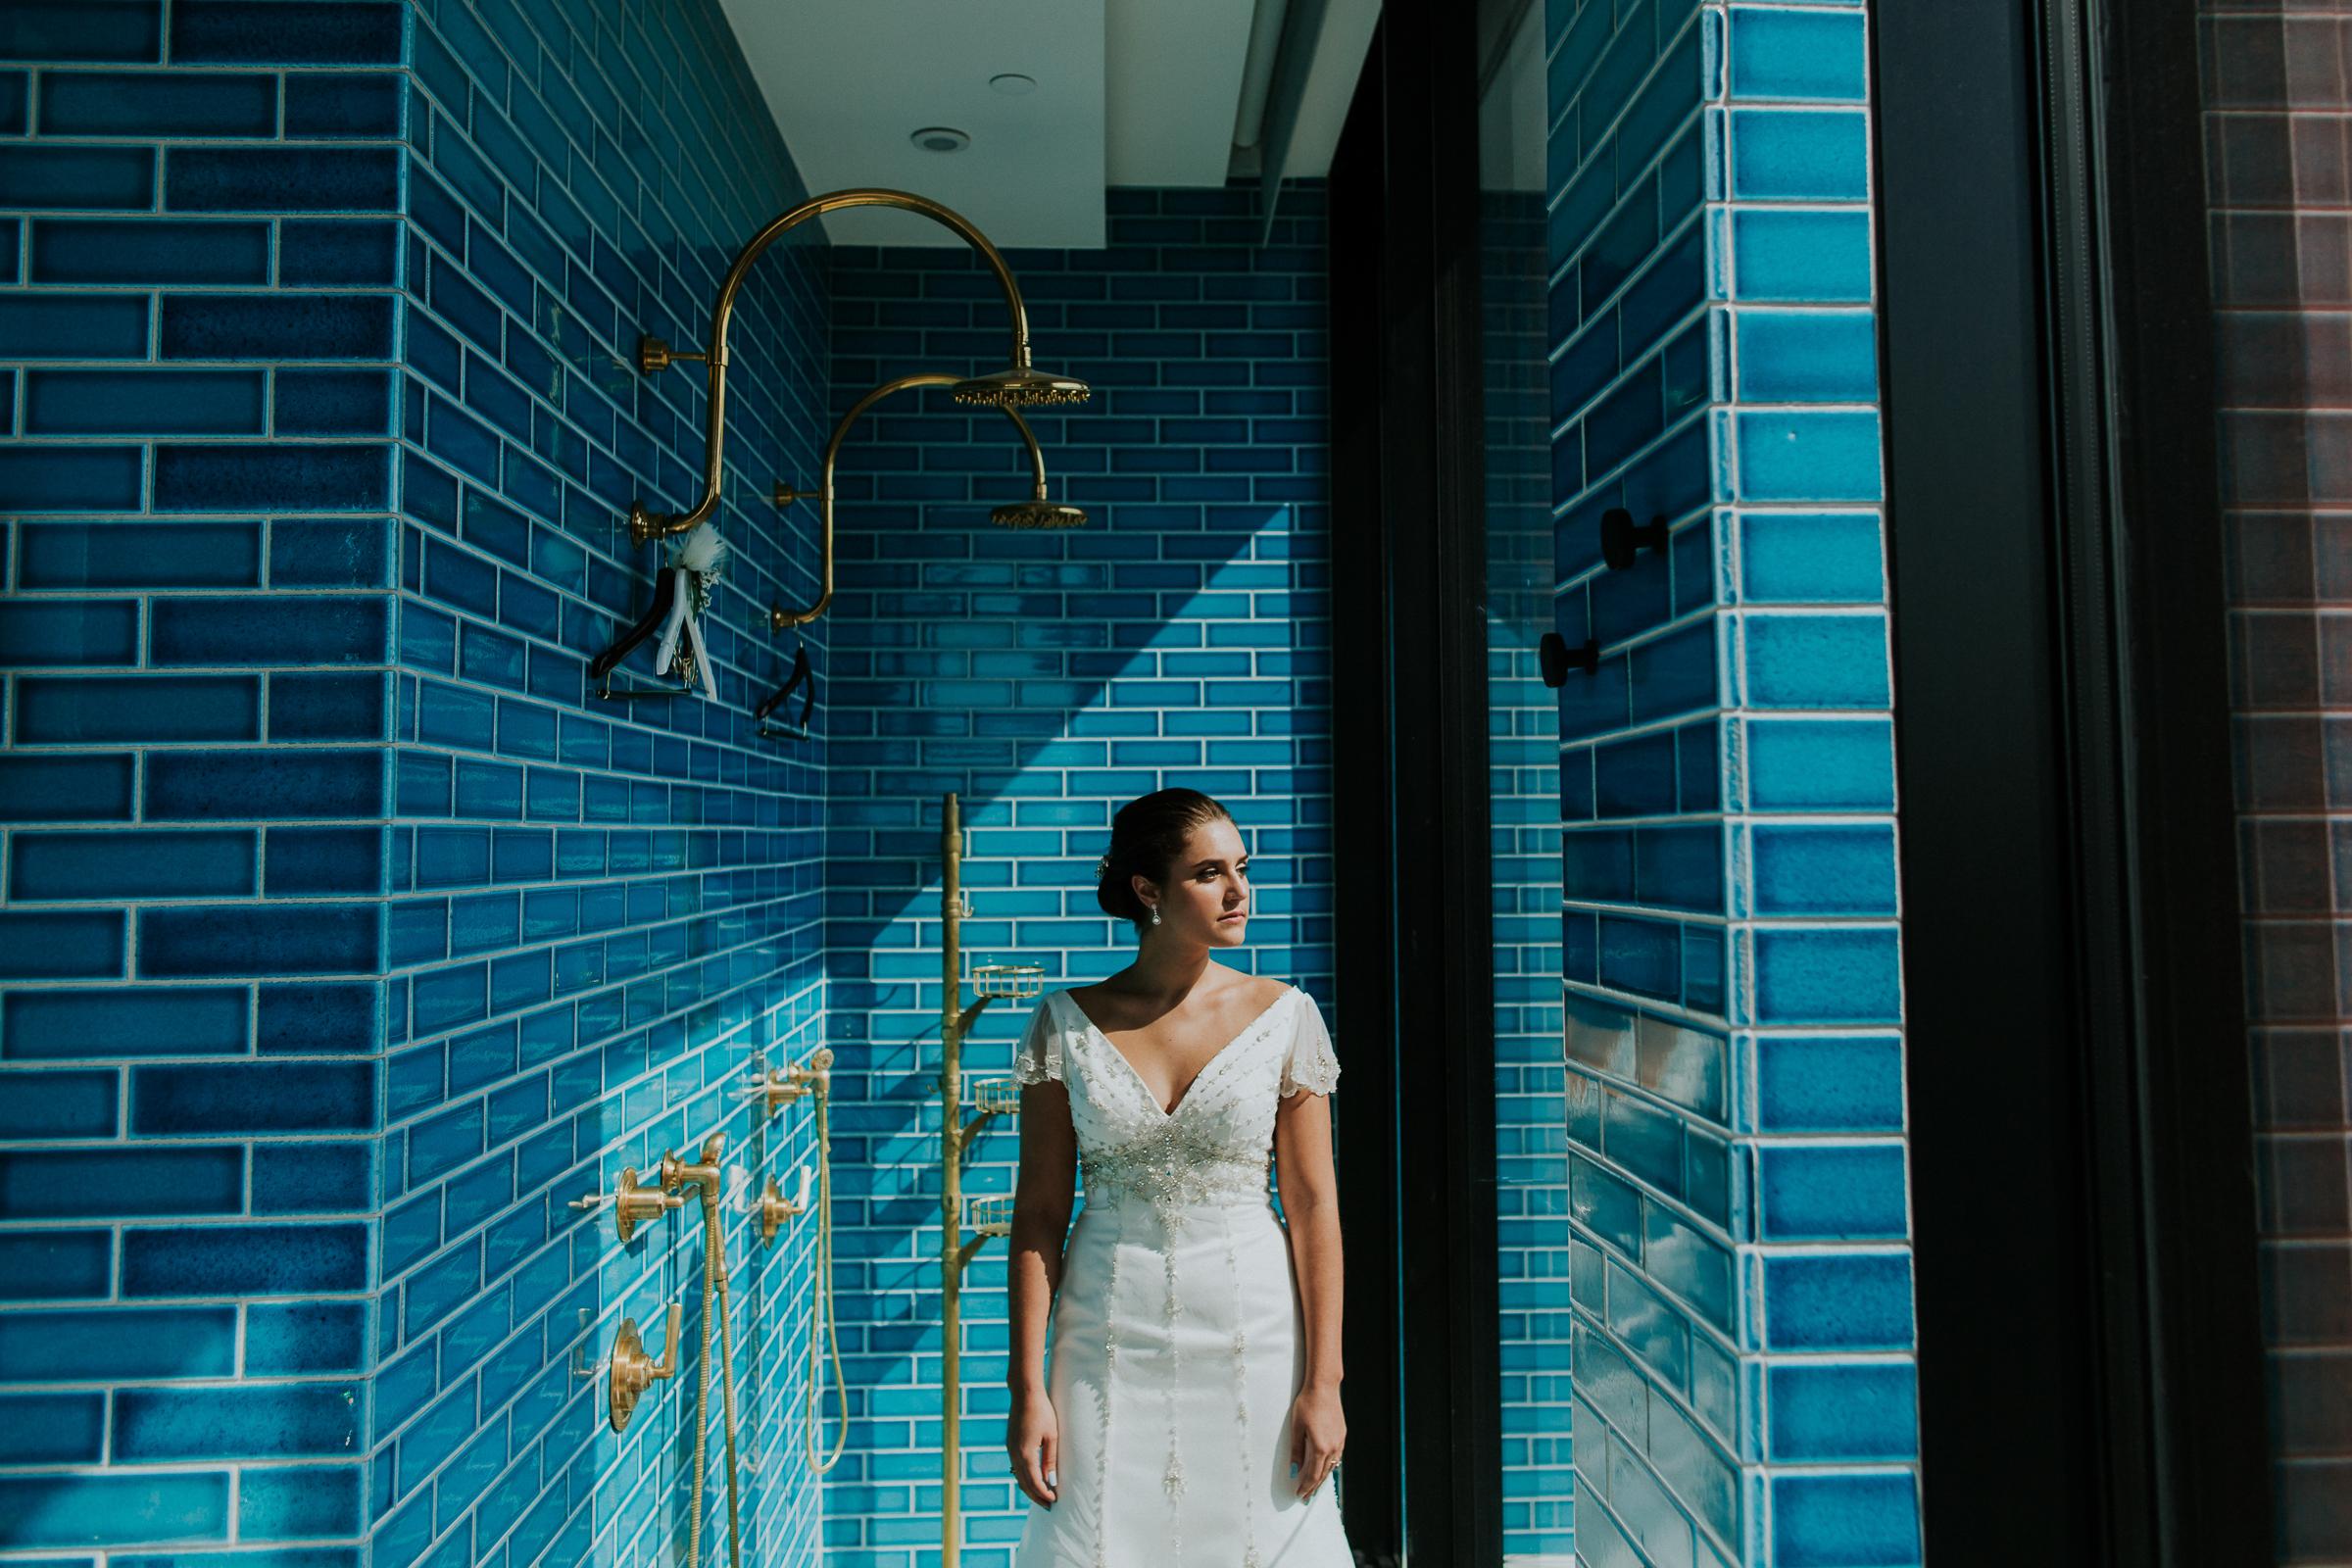 Brooklyn-Winery-NYC-Editorial-Documentary-Wedding-Photographer-Gina-Oli-17.jpg